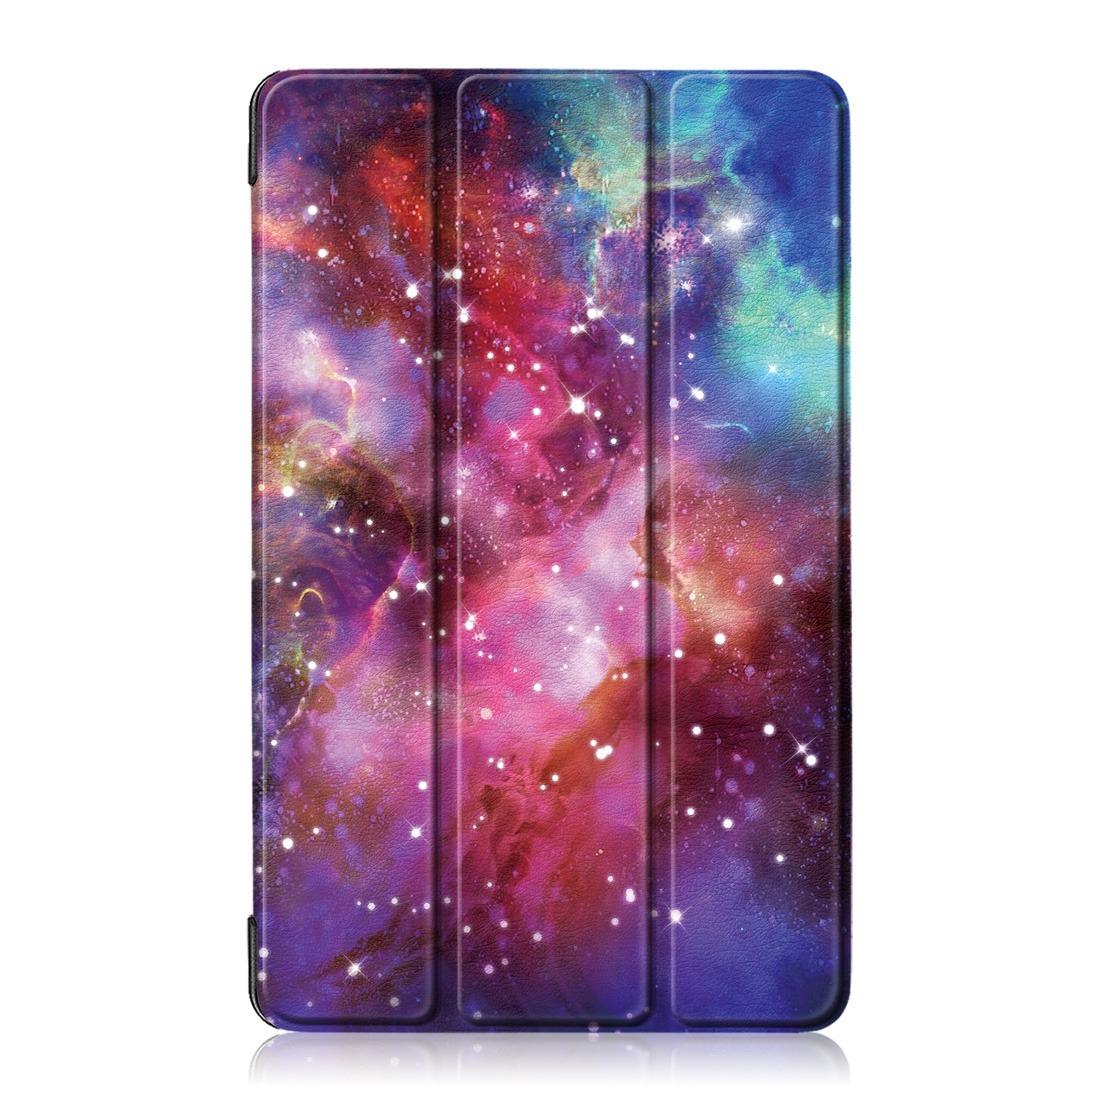 Galaxia Padrao Colorido Desenho Horizontal Sacudidela Couro R